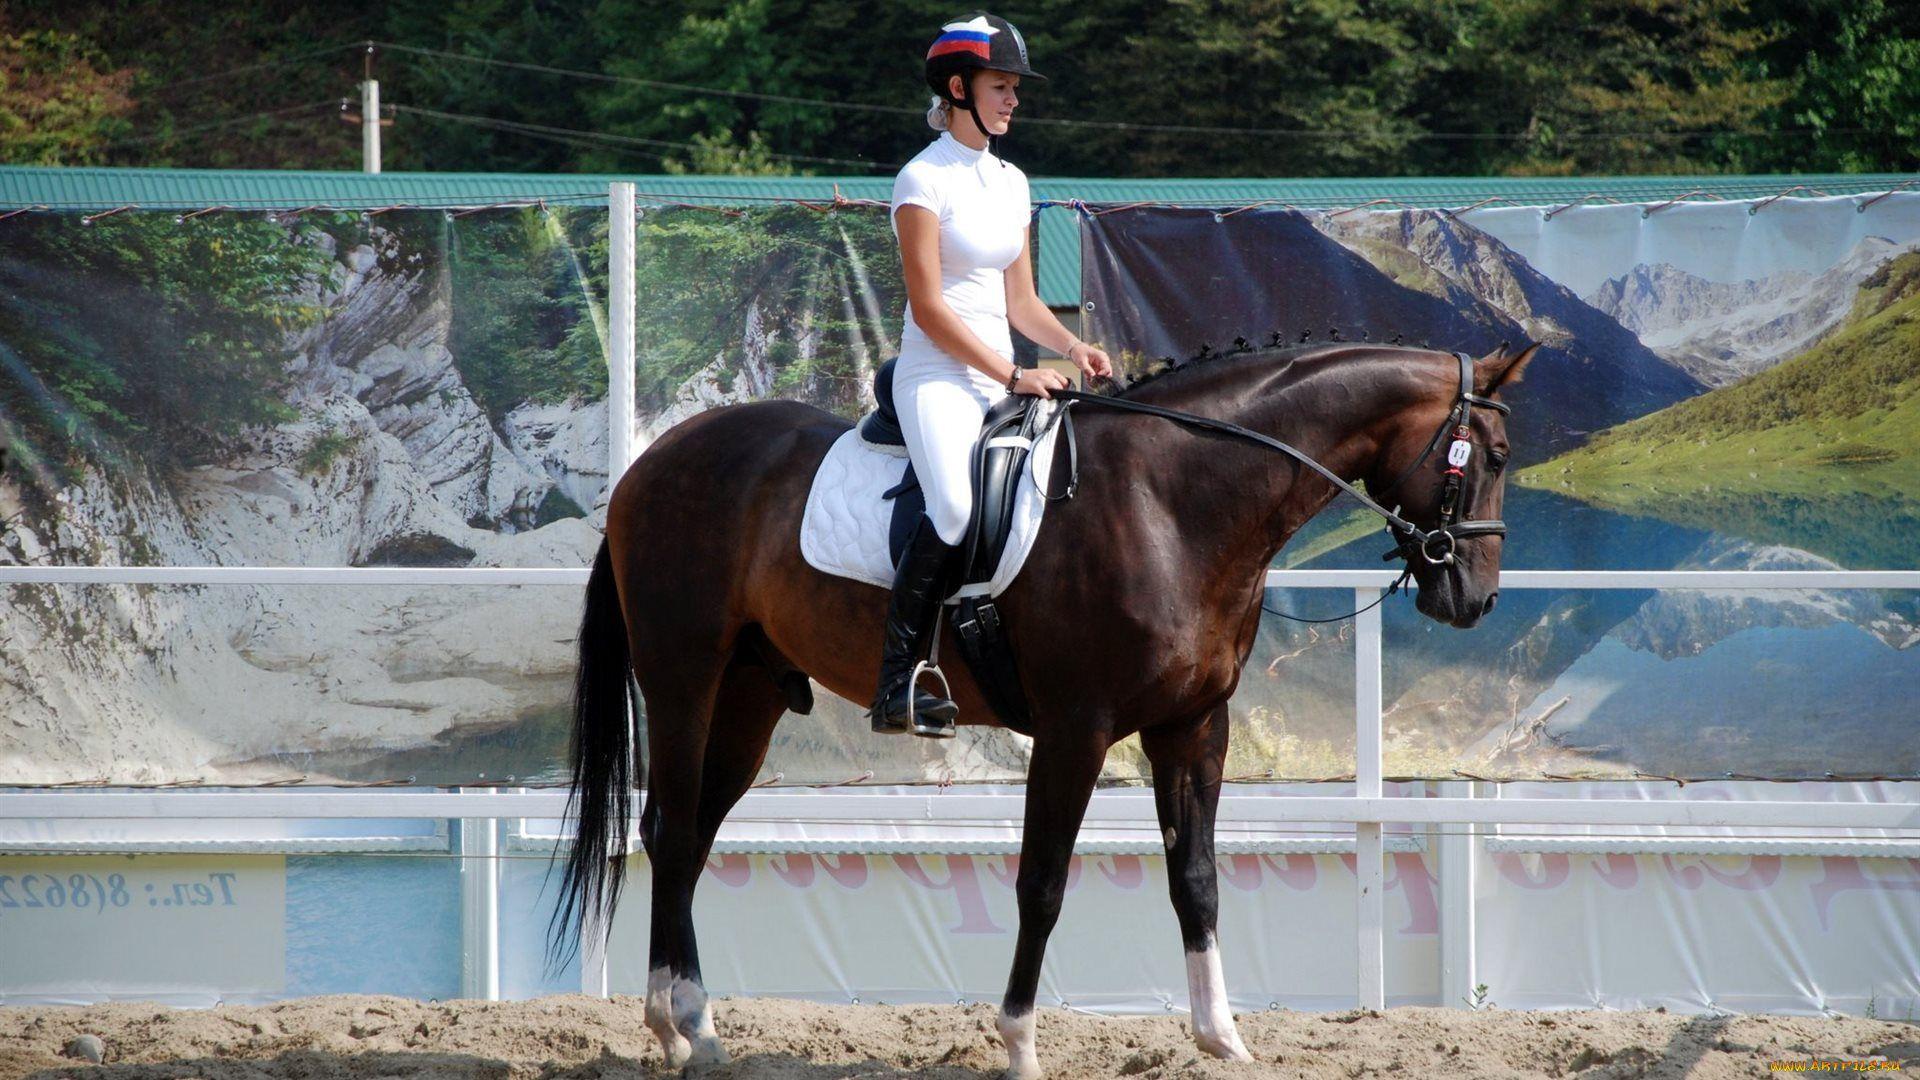 Equestrian Picture